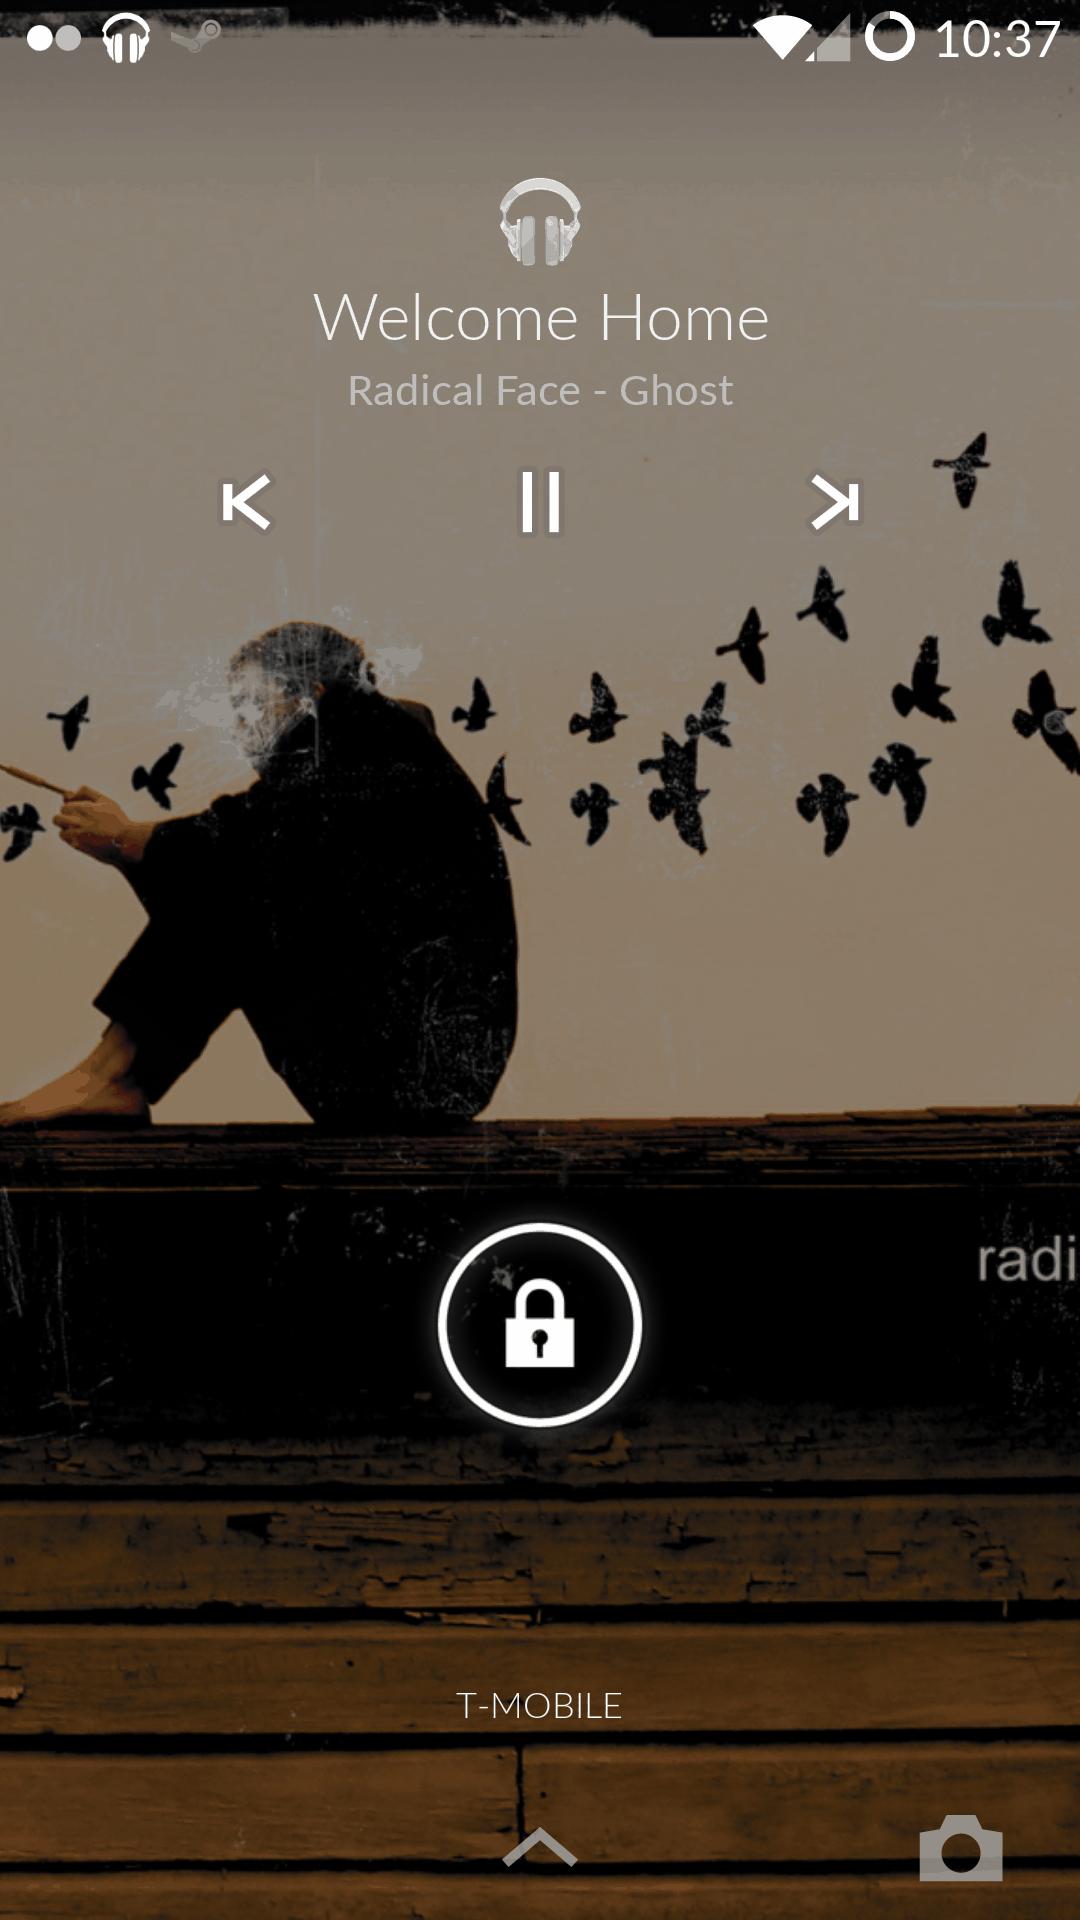 Screenshot 2014 06 26 10 37 34